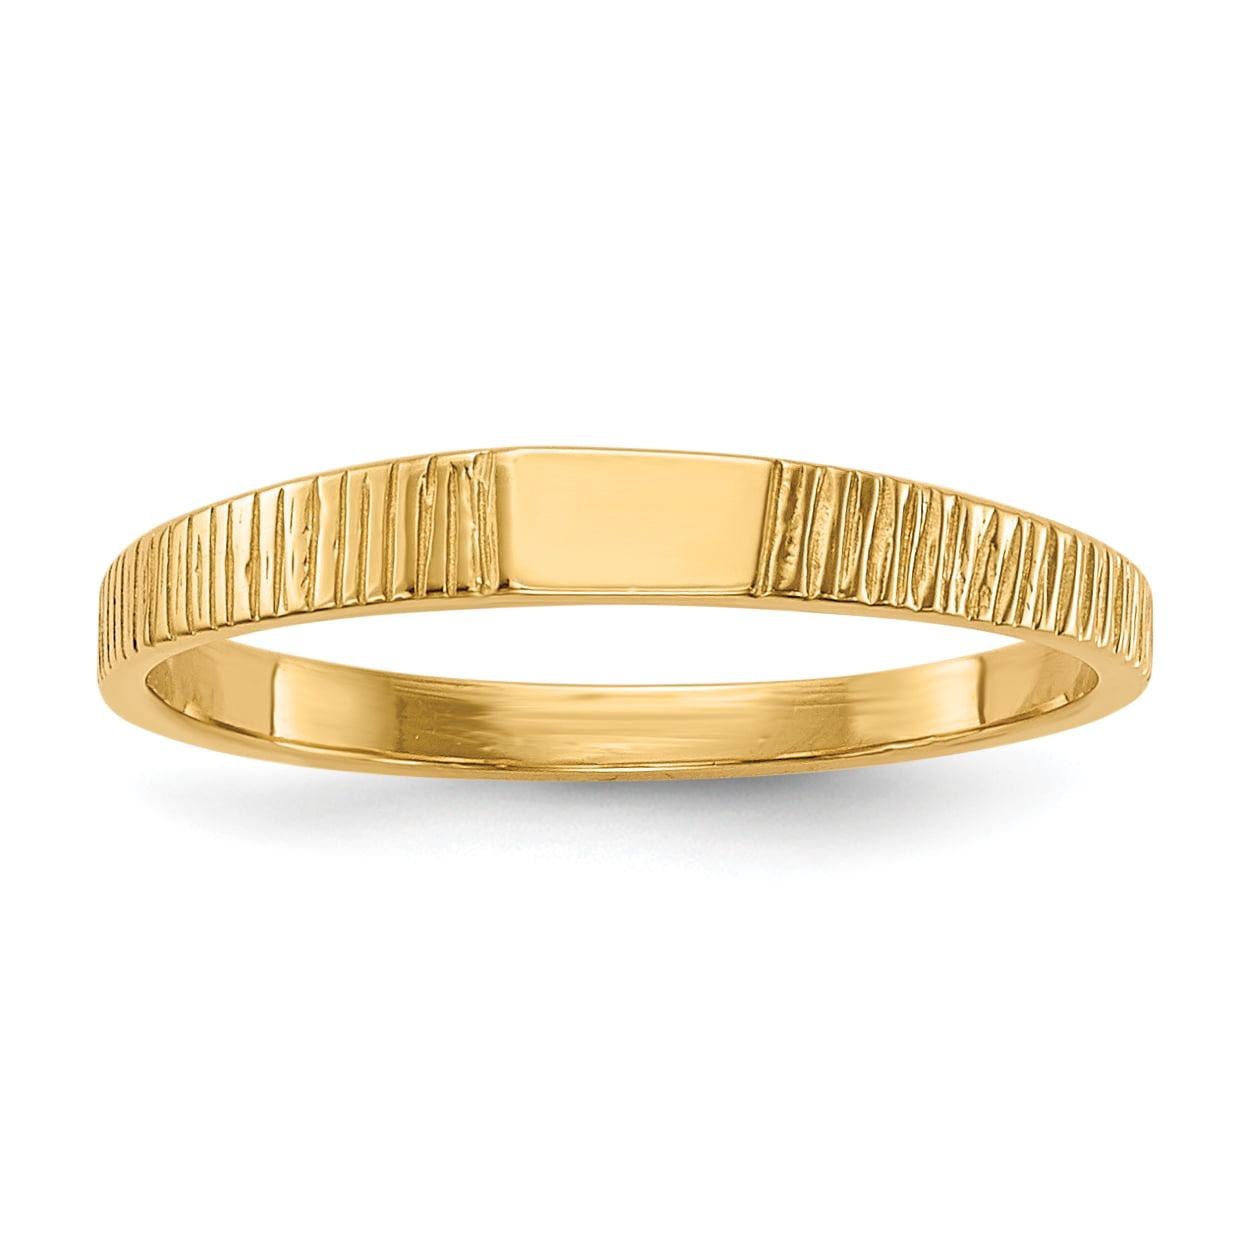 14K Yellow Gold Polished & Ridged Baby Ring - image 5 of 5